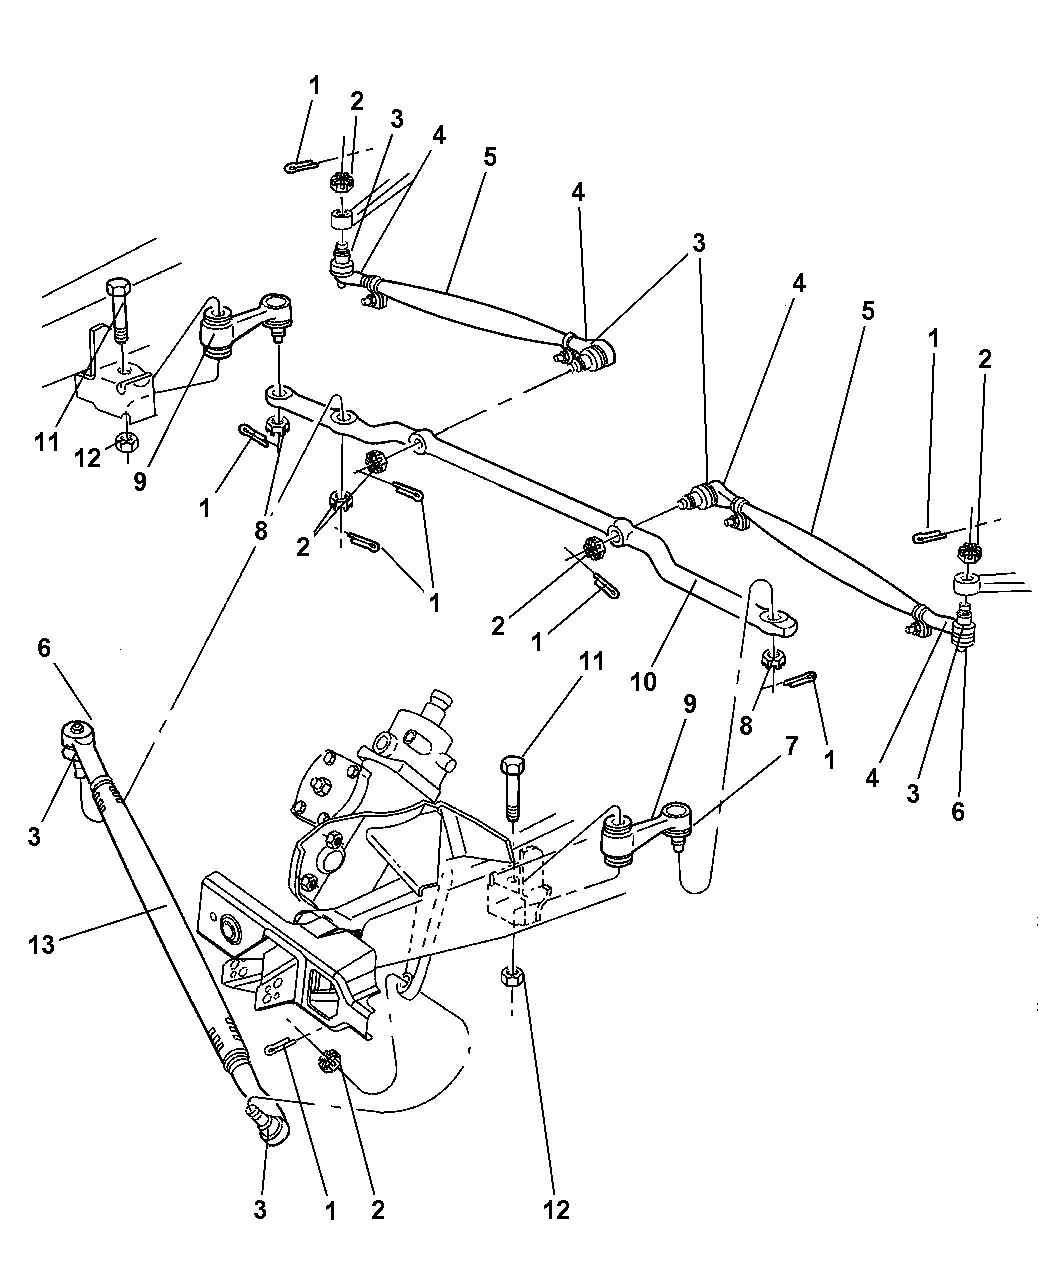 1997 dodge ram van steering linkage - thumbnail 1